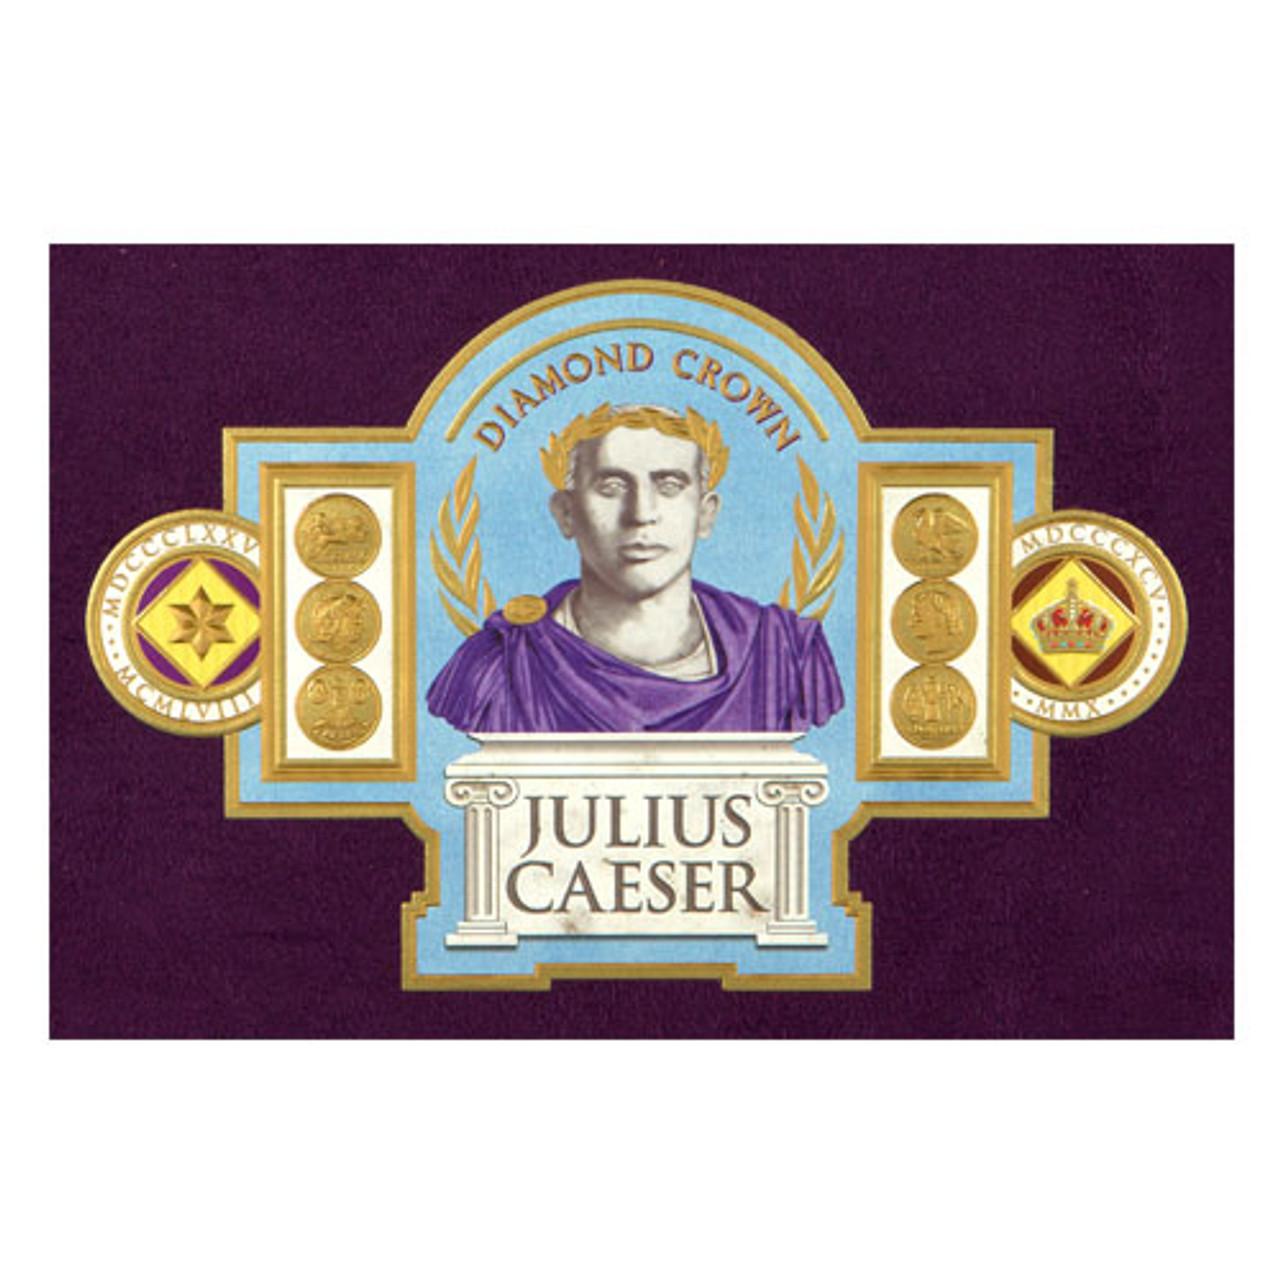 Diamond Crown Julius Caesar Churchill Cigars - 7.25 x 52 (Box of 20)